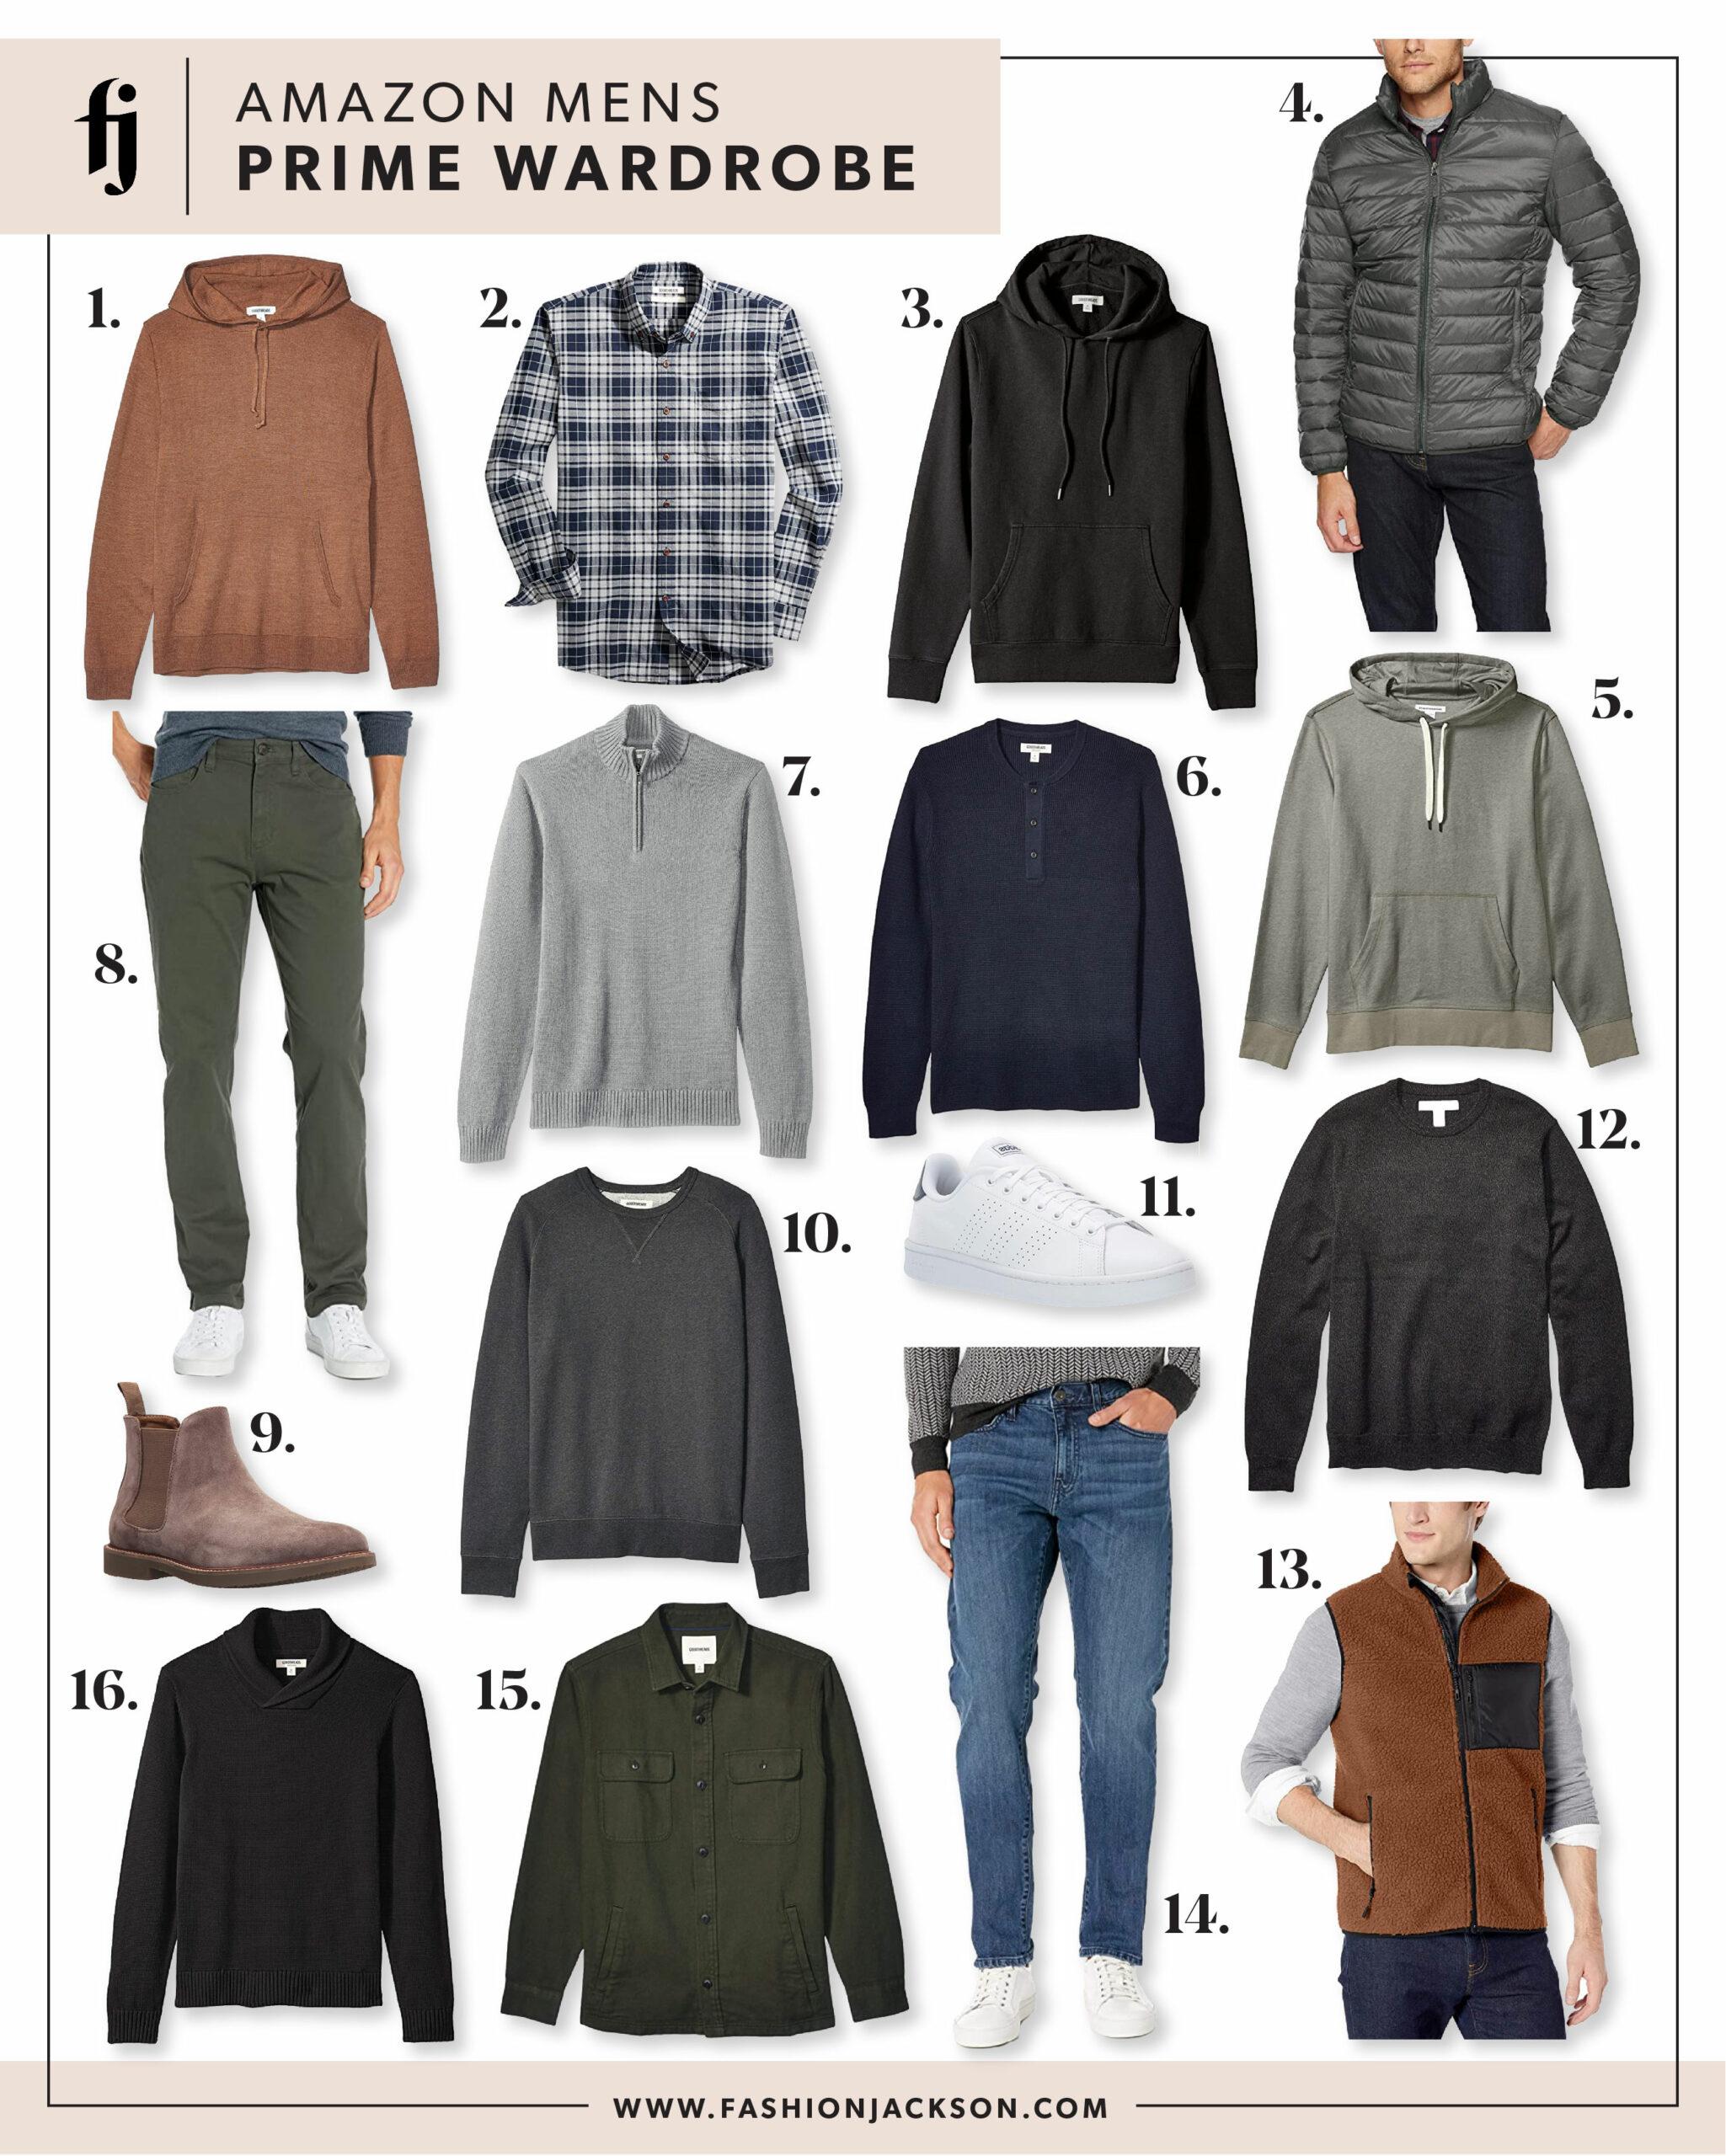 Amazon Prime Wardrobe Mens